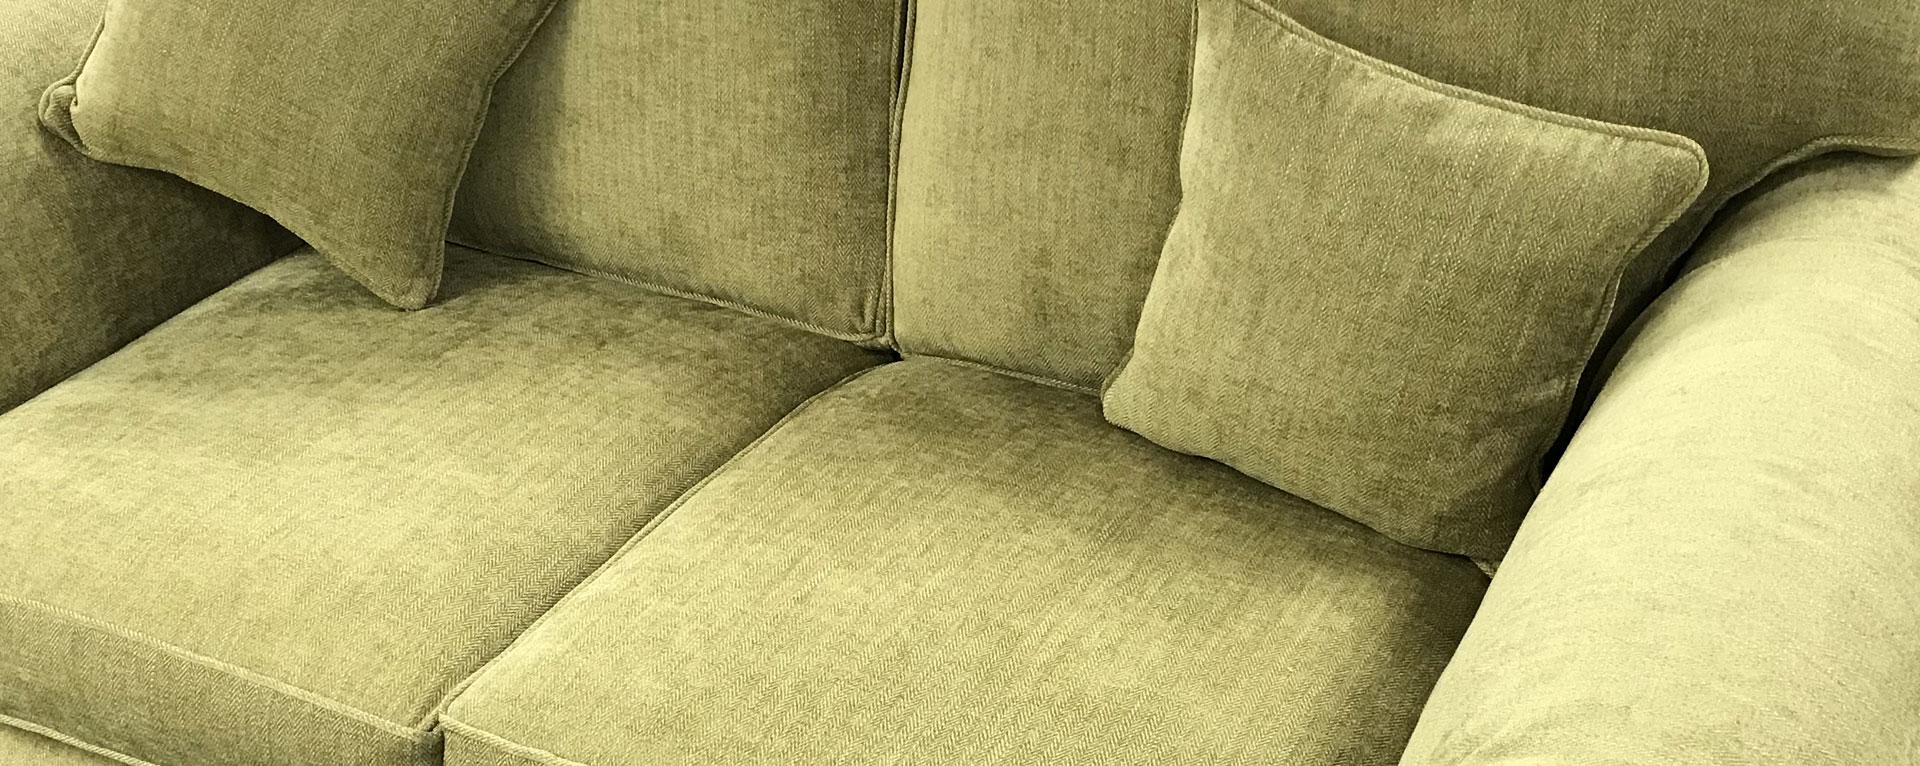 Bristol Upholstery Soft Furnishings Co